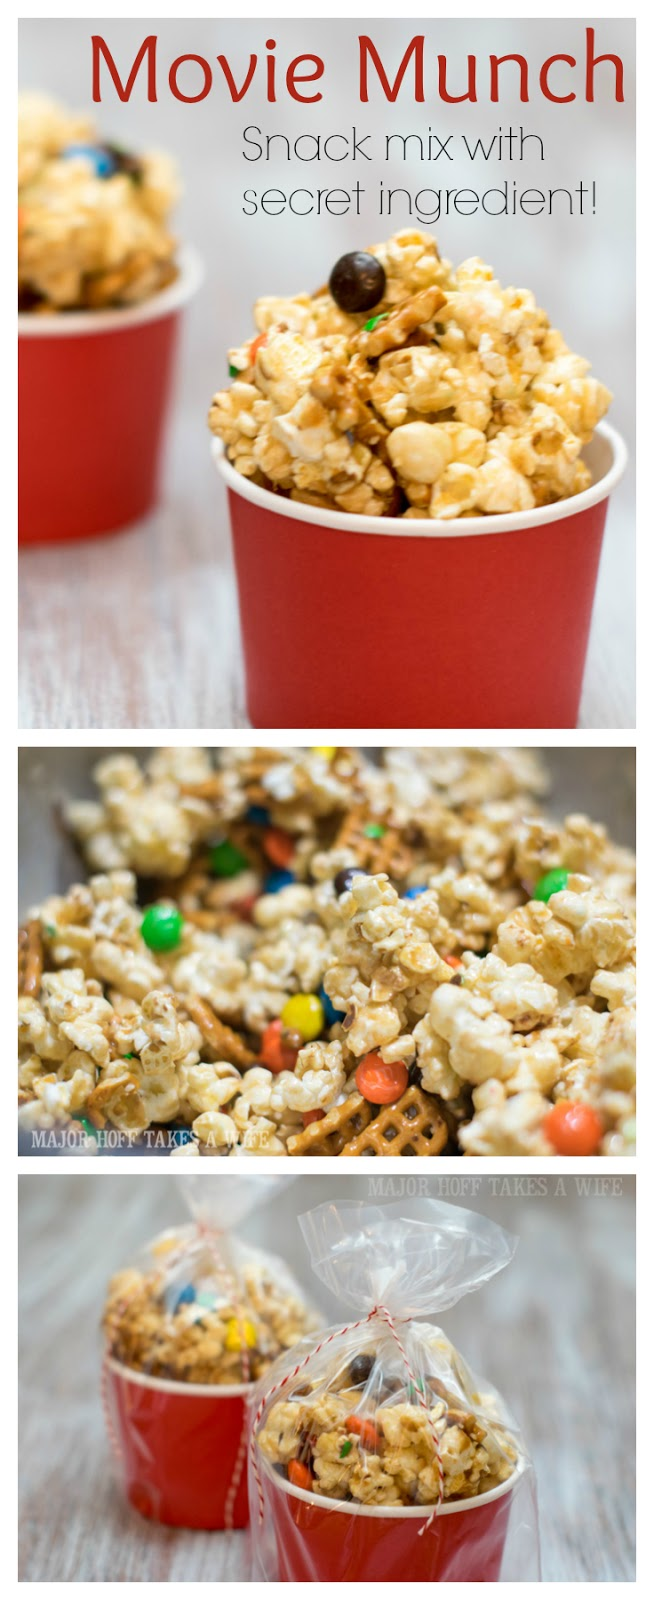 Movie Munch Popcorn Snack